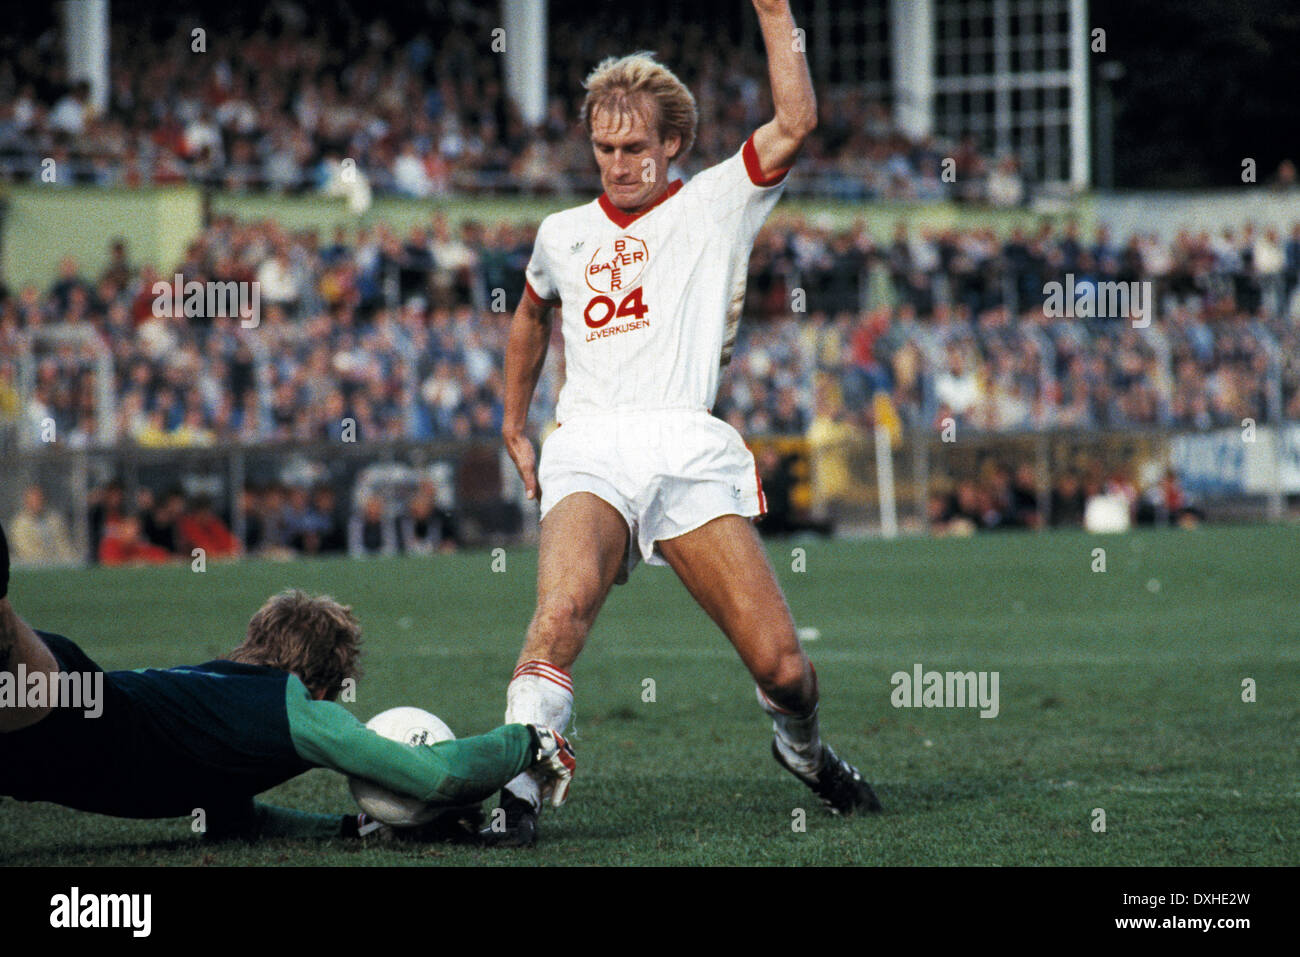 football, Bundesliga, 1983/1984, Grotenburg Stadium, FC Bayer 05 Uerdingen versus Bayer 04 Leverkusen 2:1, scene of the match, keeper Werner Vollack (Uerdingen) left and Frank Saborowski (Leverkusen) - Stock Image